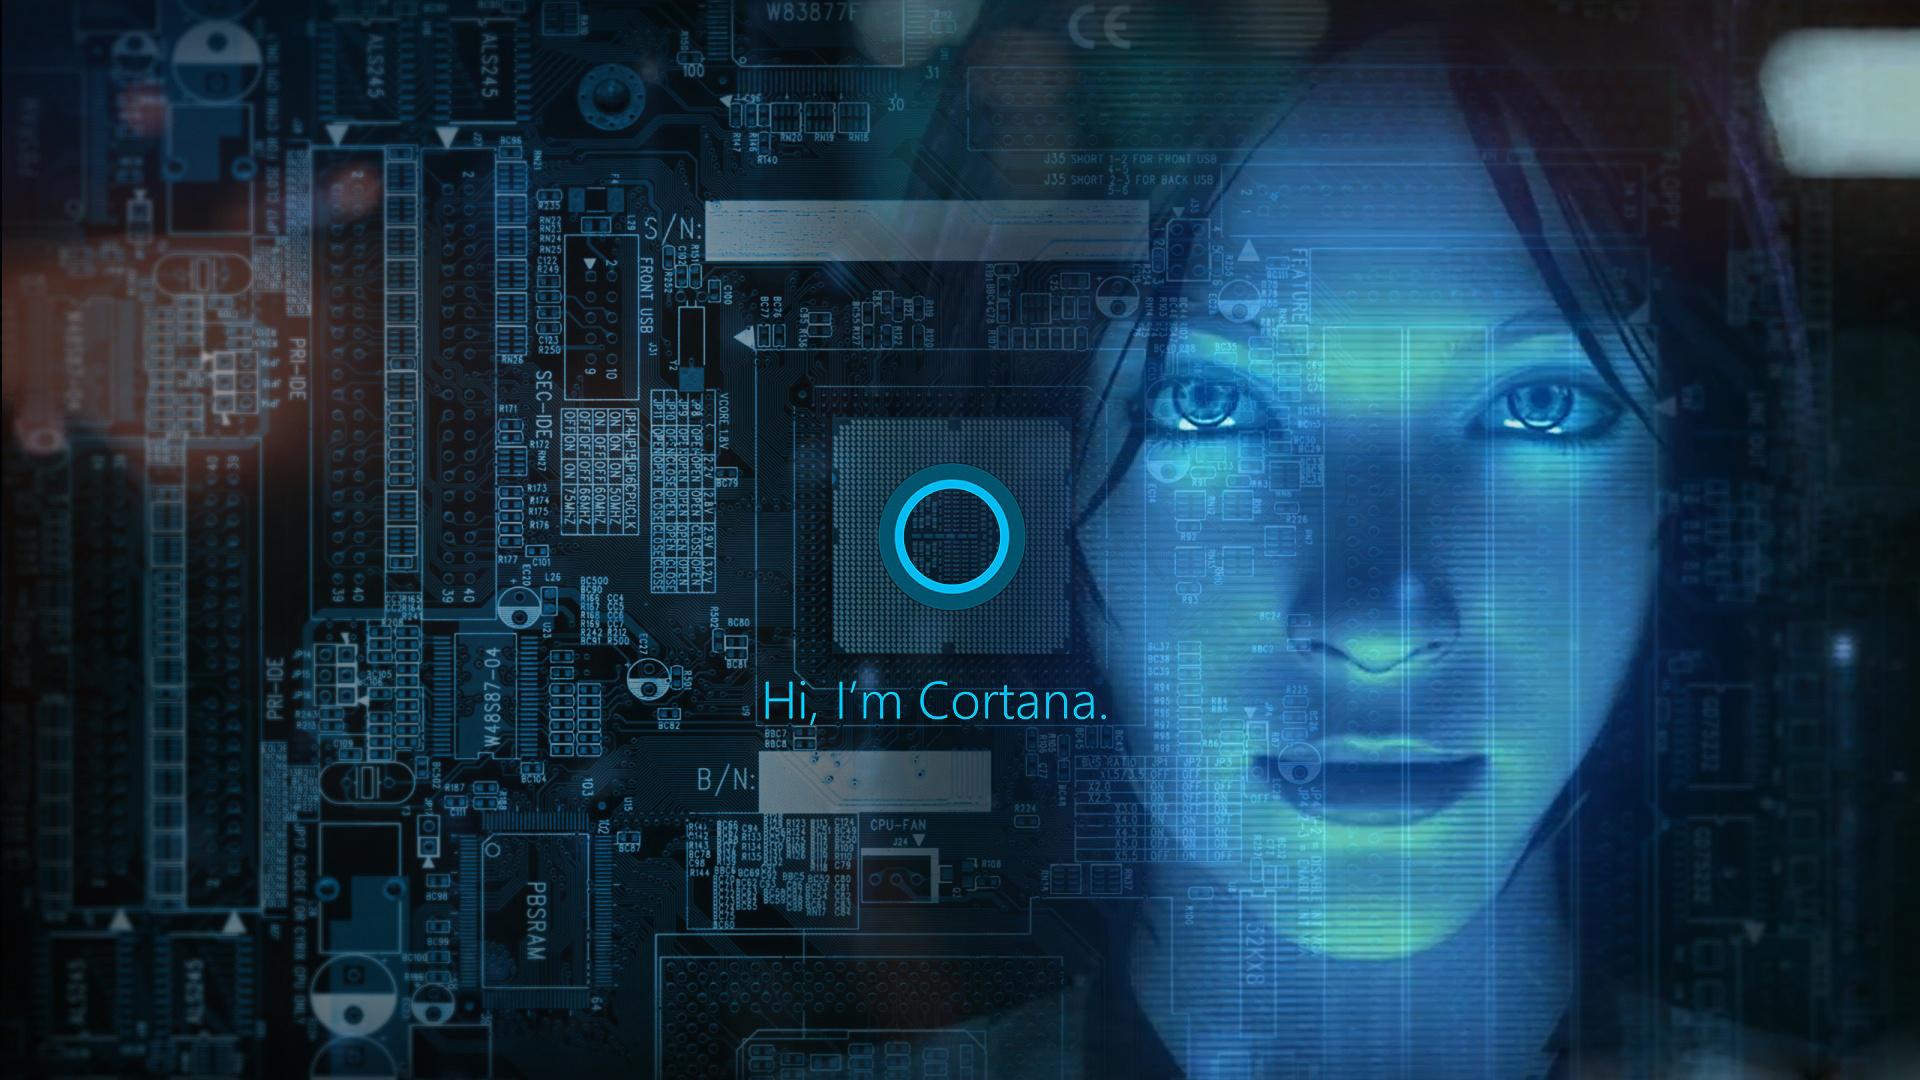 46 Cortana Wallpaper Windows 10 On Wallpapersafari